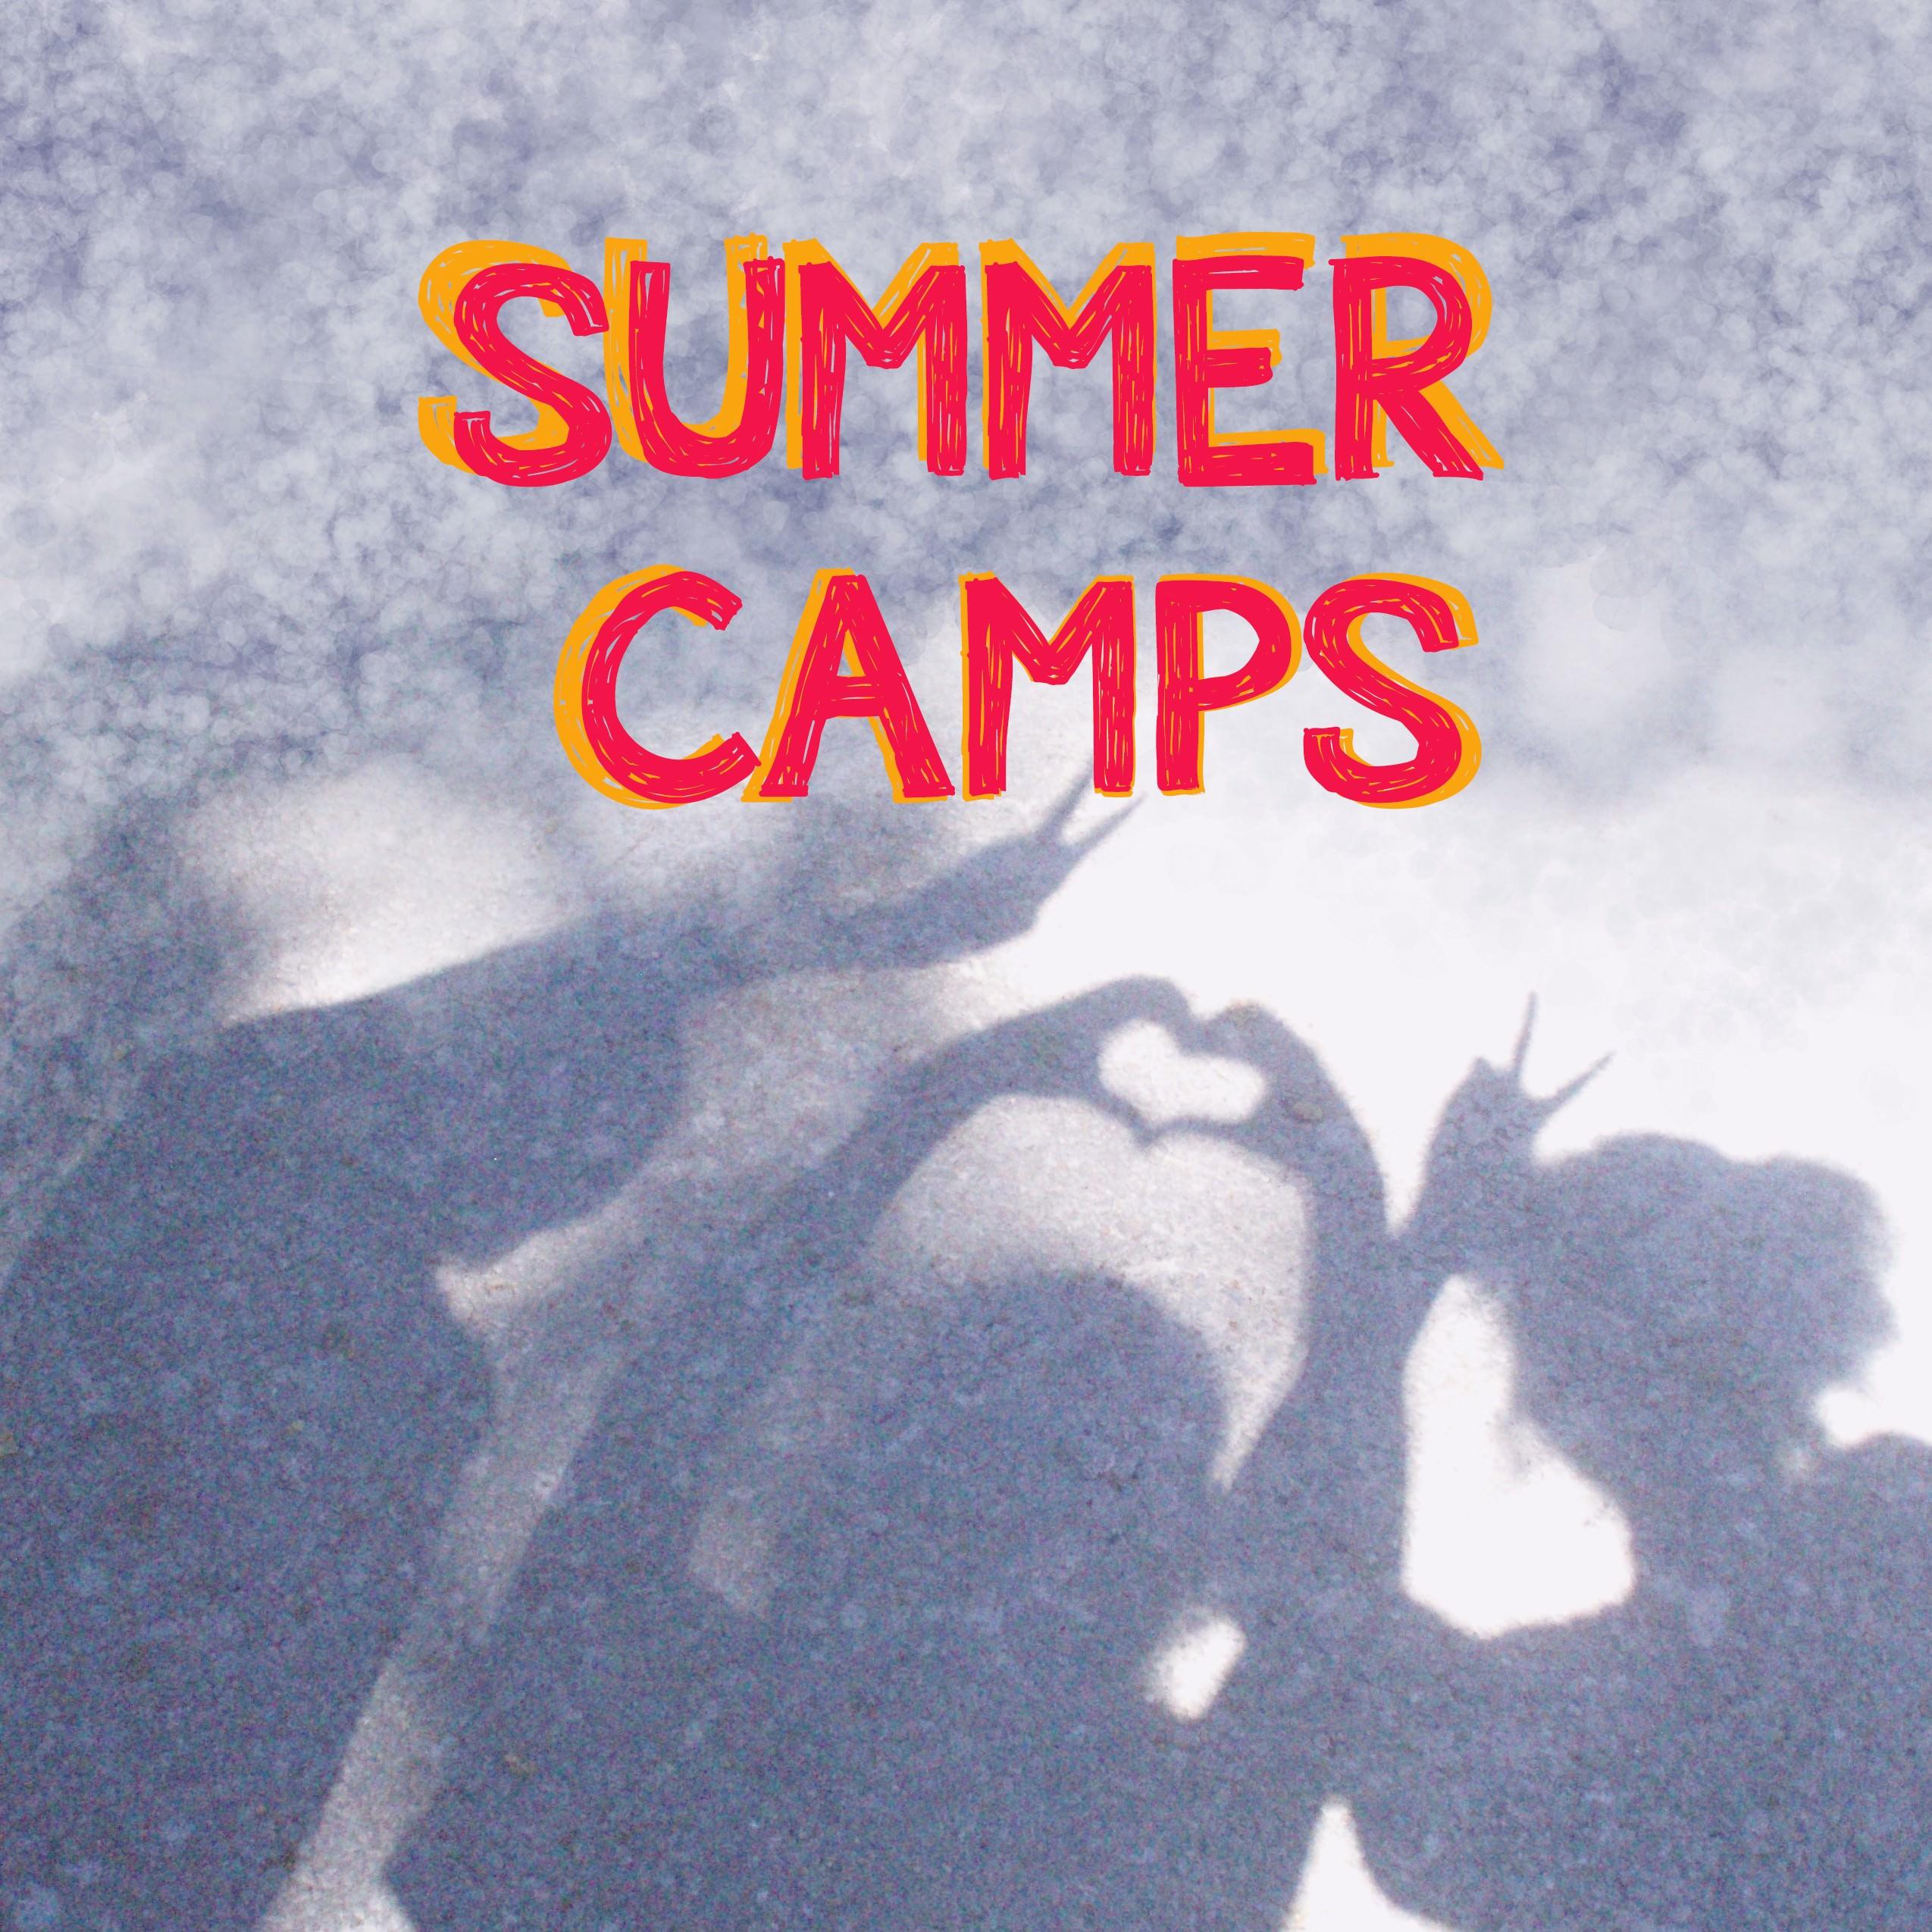 Kids Camp Poster 2014